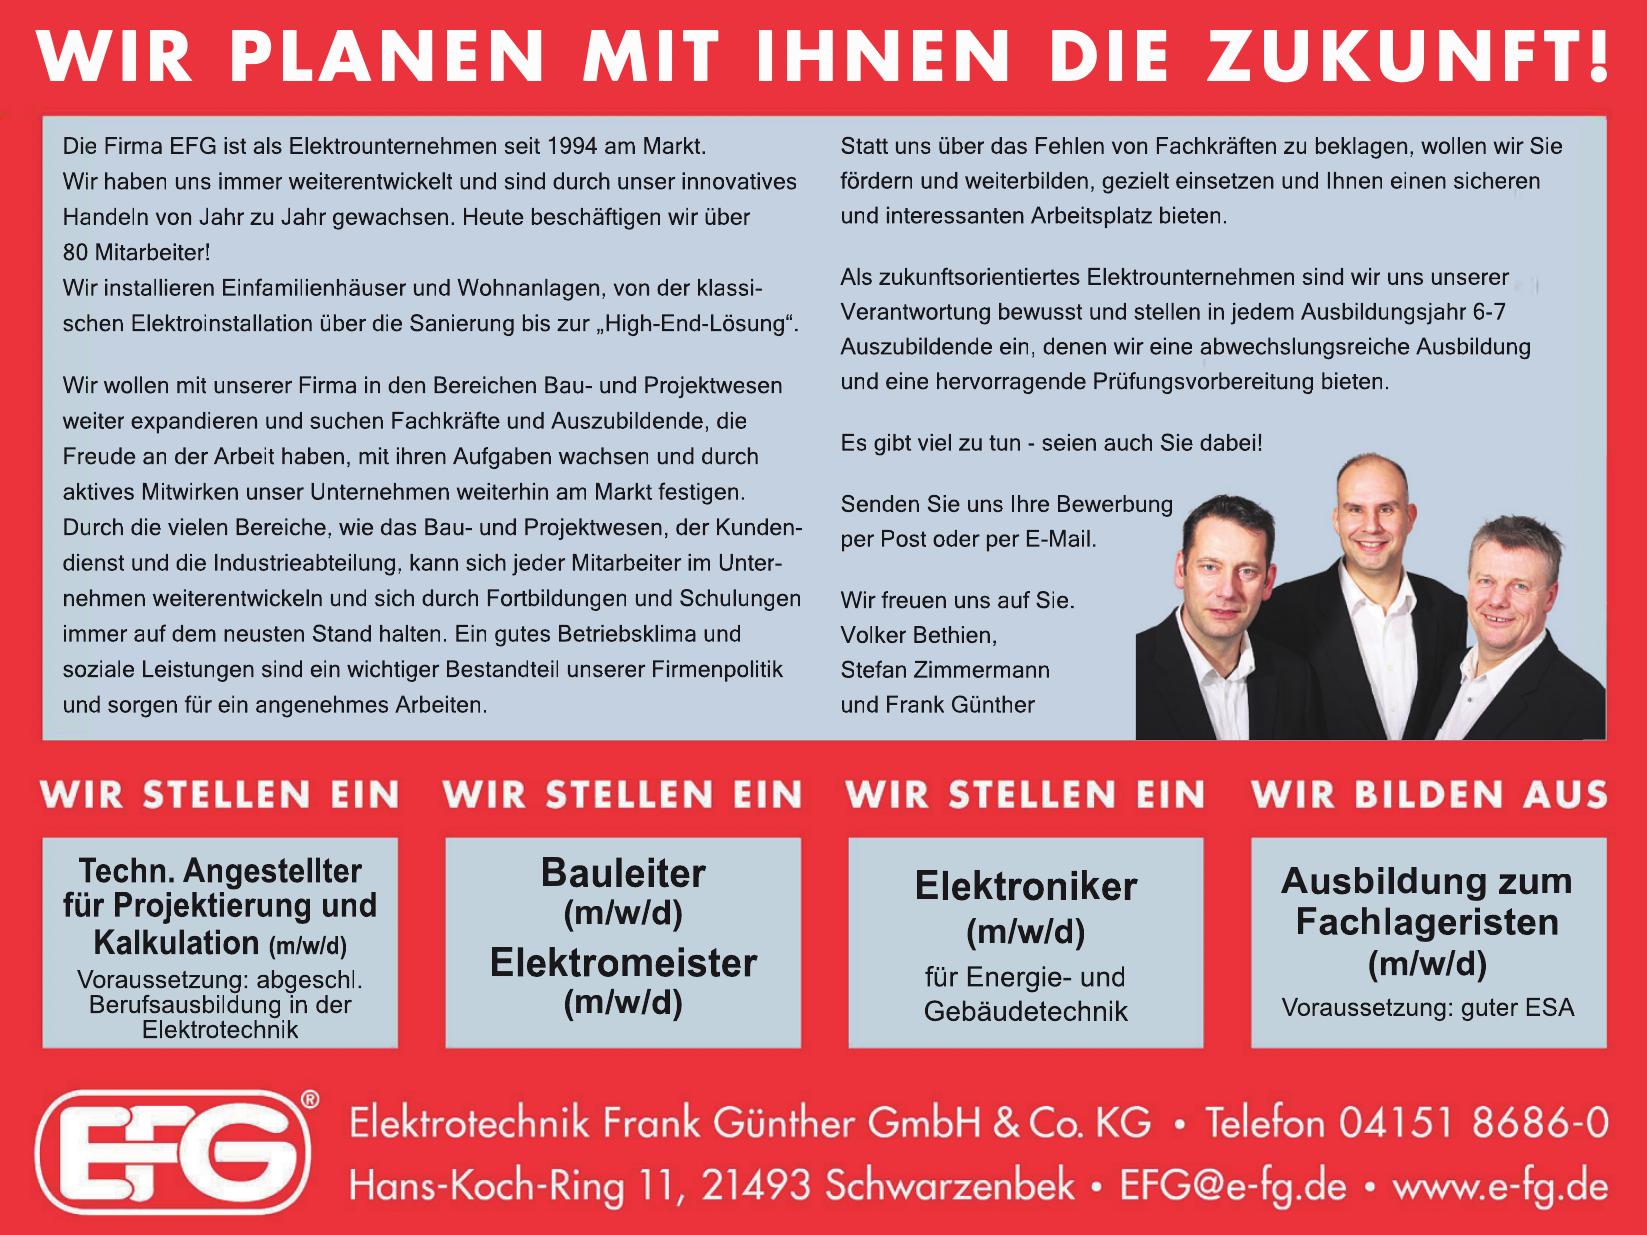 Elektrotechnik Frank Günther GmbH & Co. KG